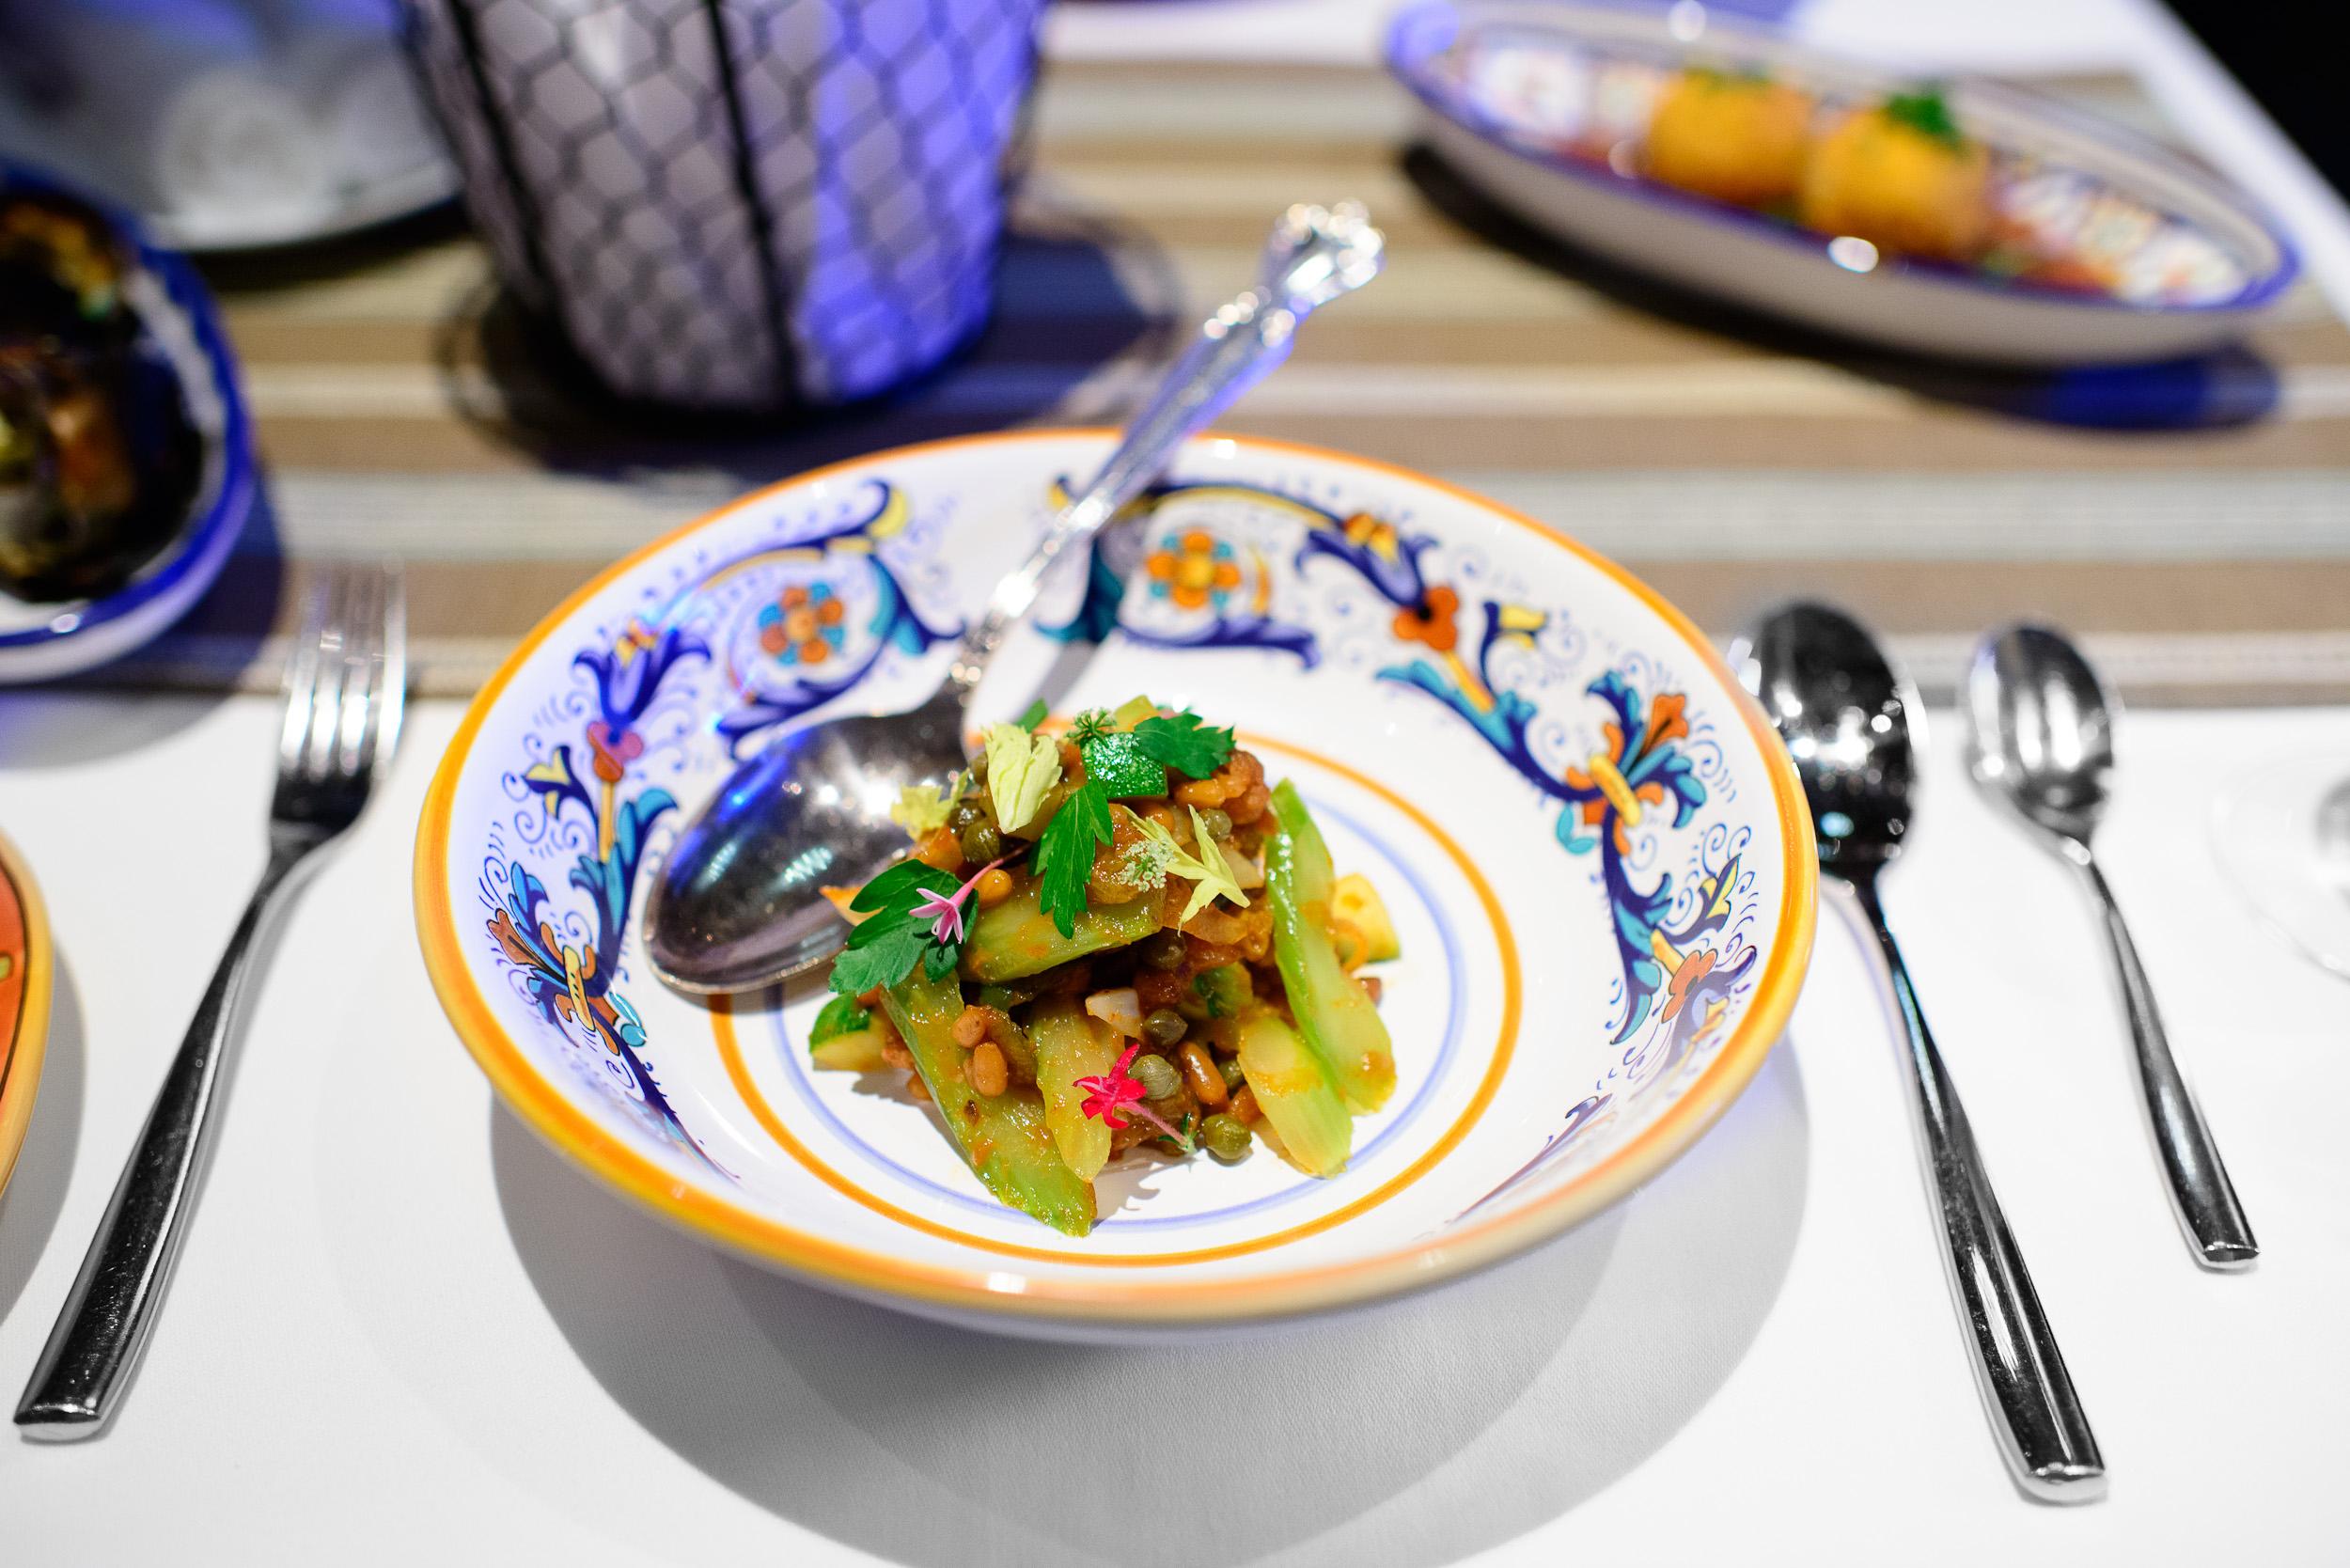 1st Course: Caponata (fried eggplant, celery seasoned with sweet